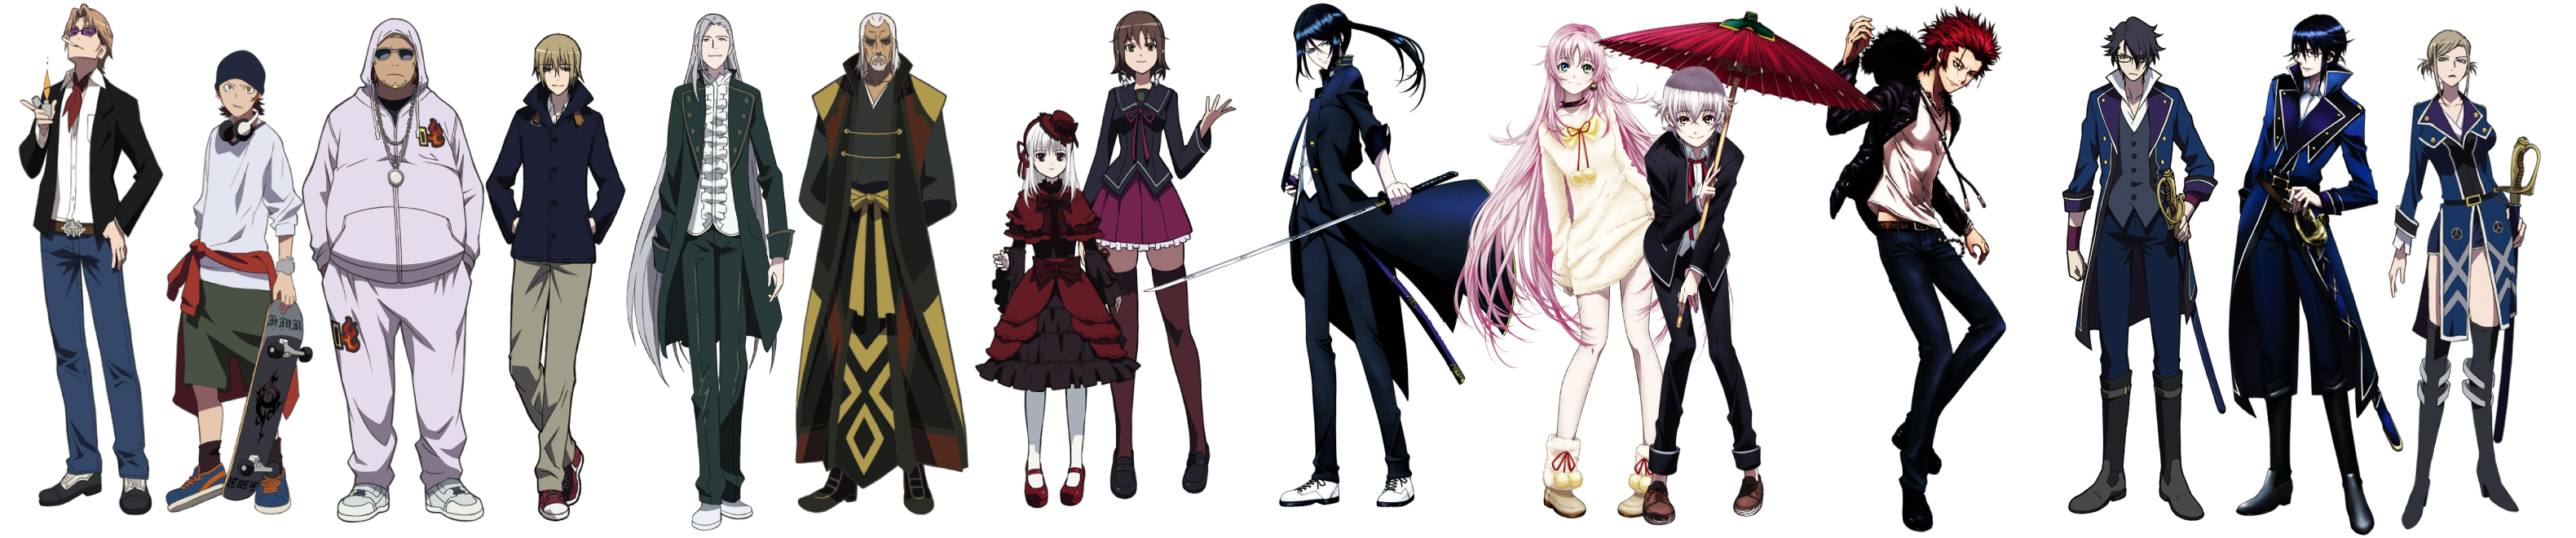 K Anime Characters Anna : Pin misaki homura k project yata on pinterest